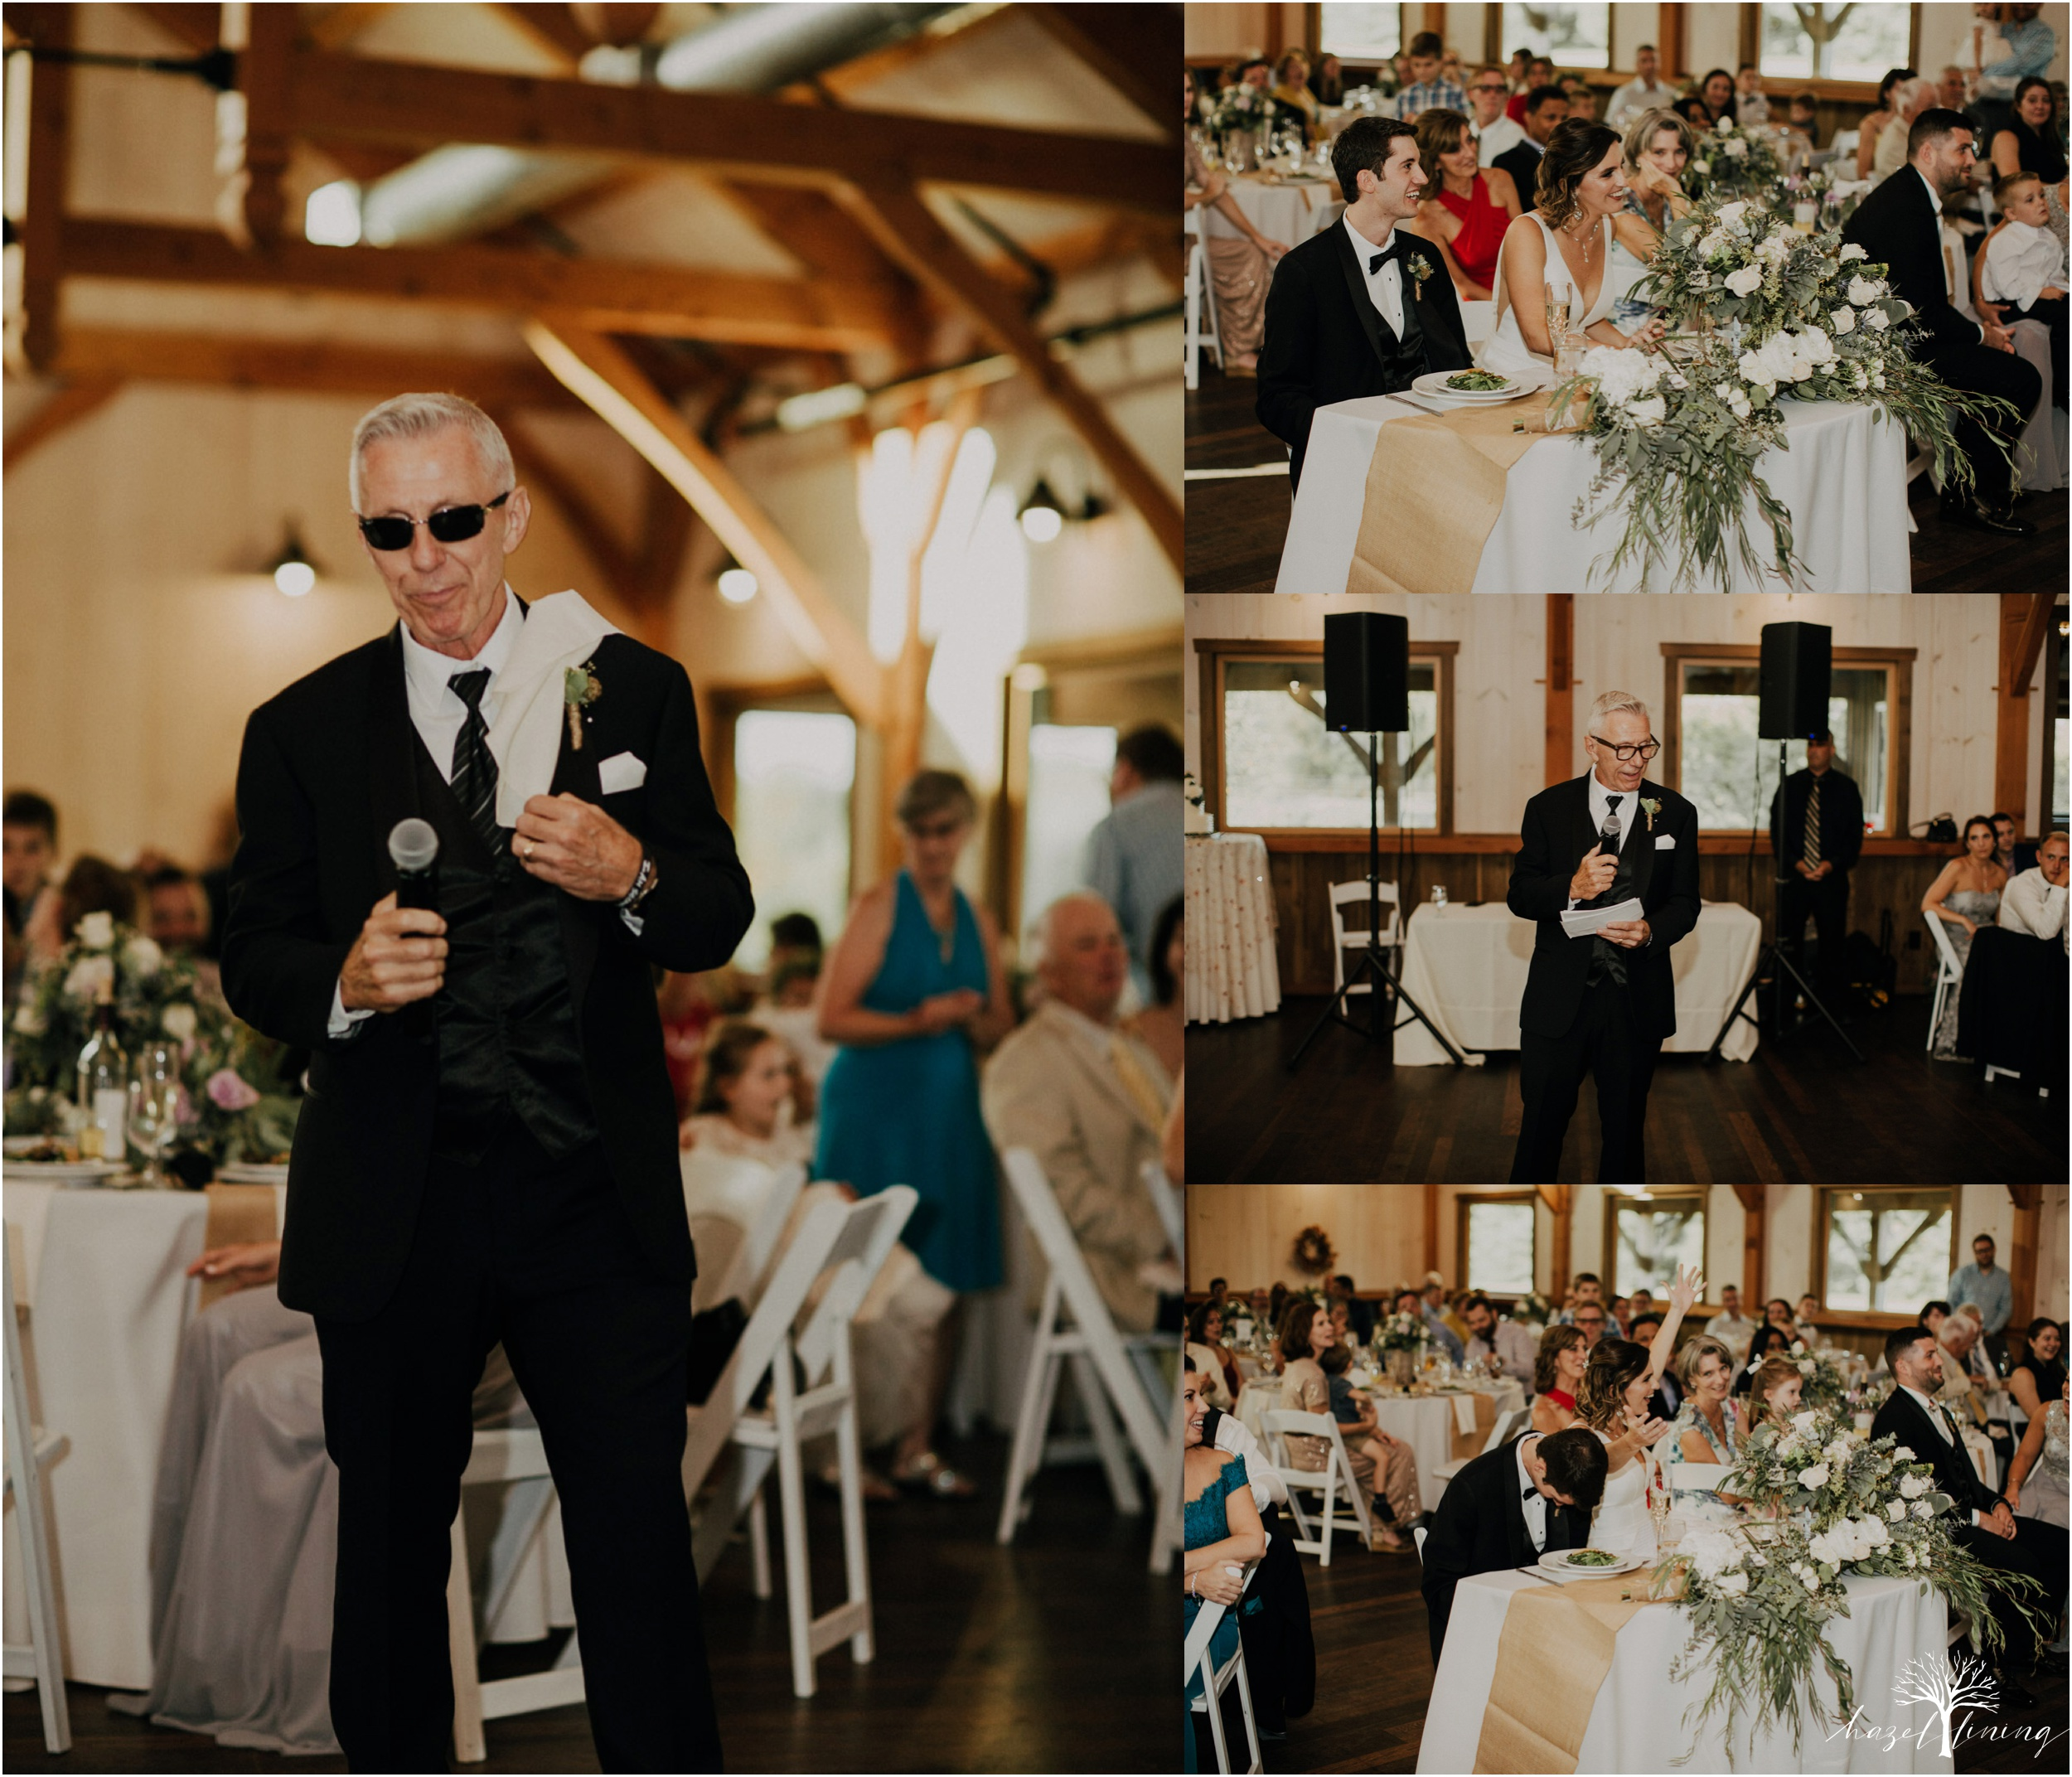 maureen-hepner-anthony-giordano-rose-bank-winery-newtow-pennsylvania-luxury-summer-wedding-hazel-lining-photography-destination-elopement-wedding-engagement-photography_0138.jpg